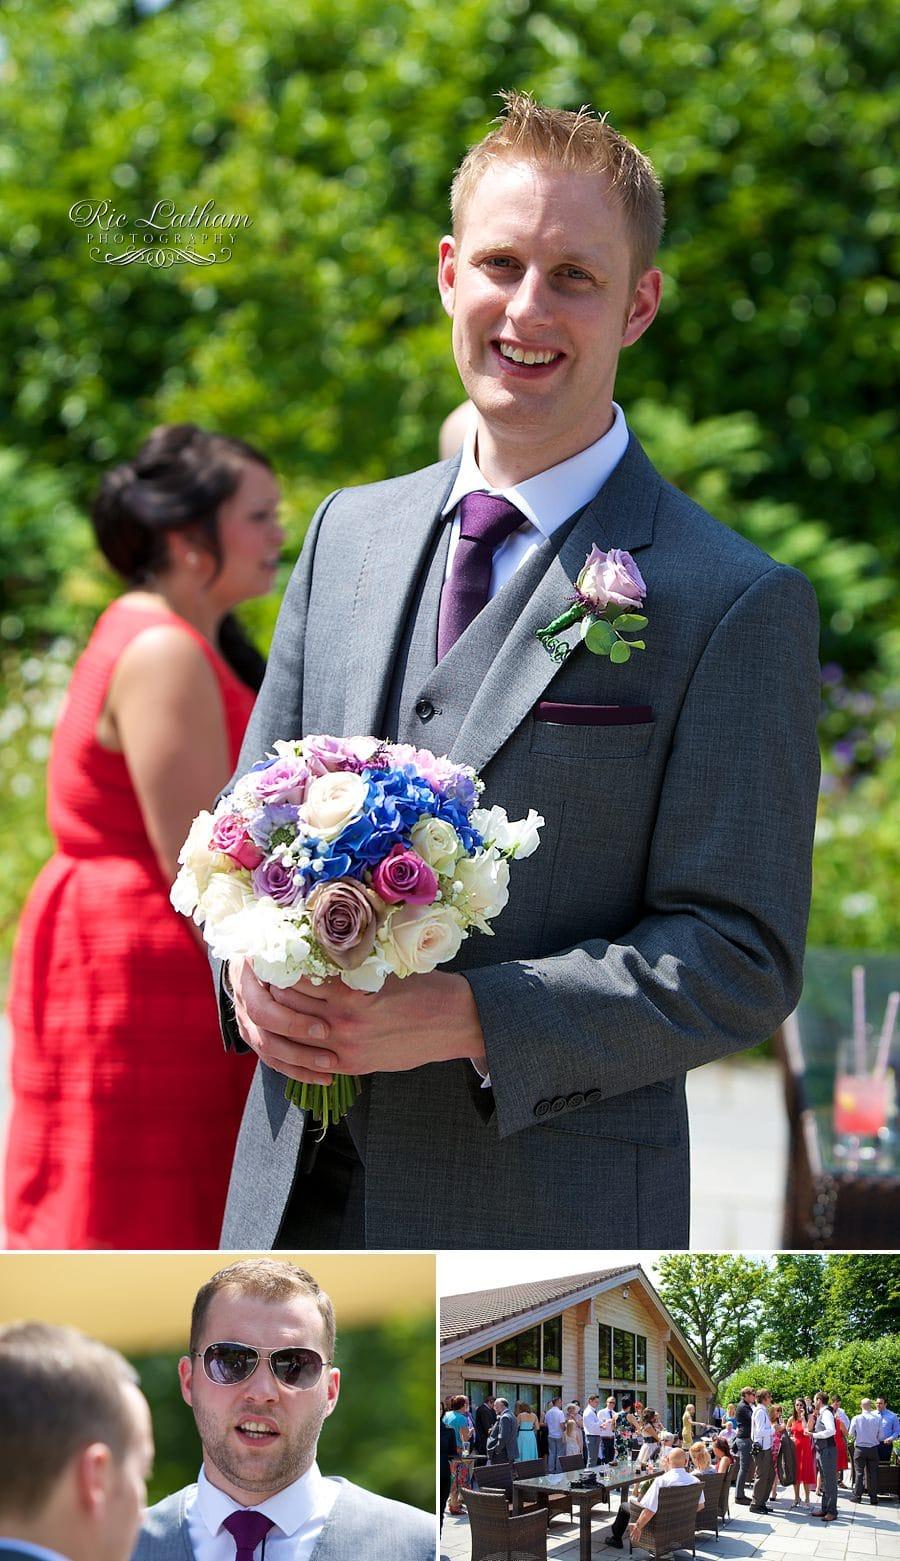 best man with bride bouquet